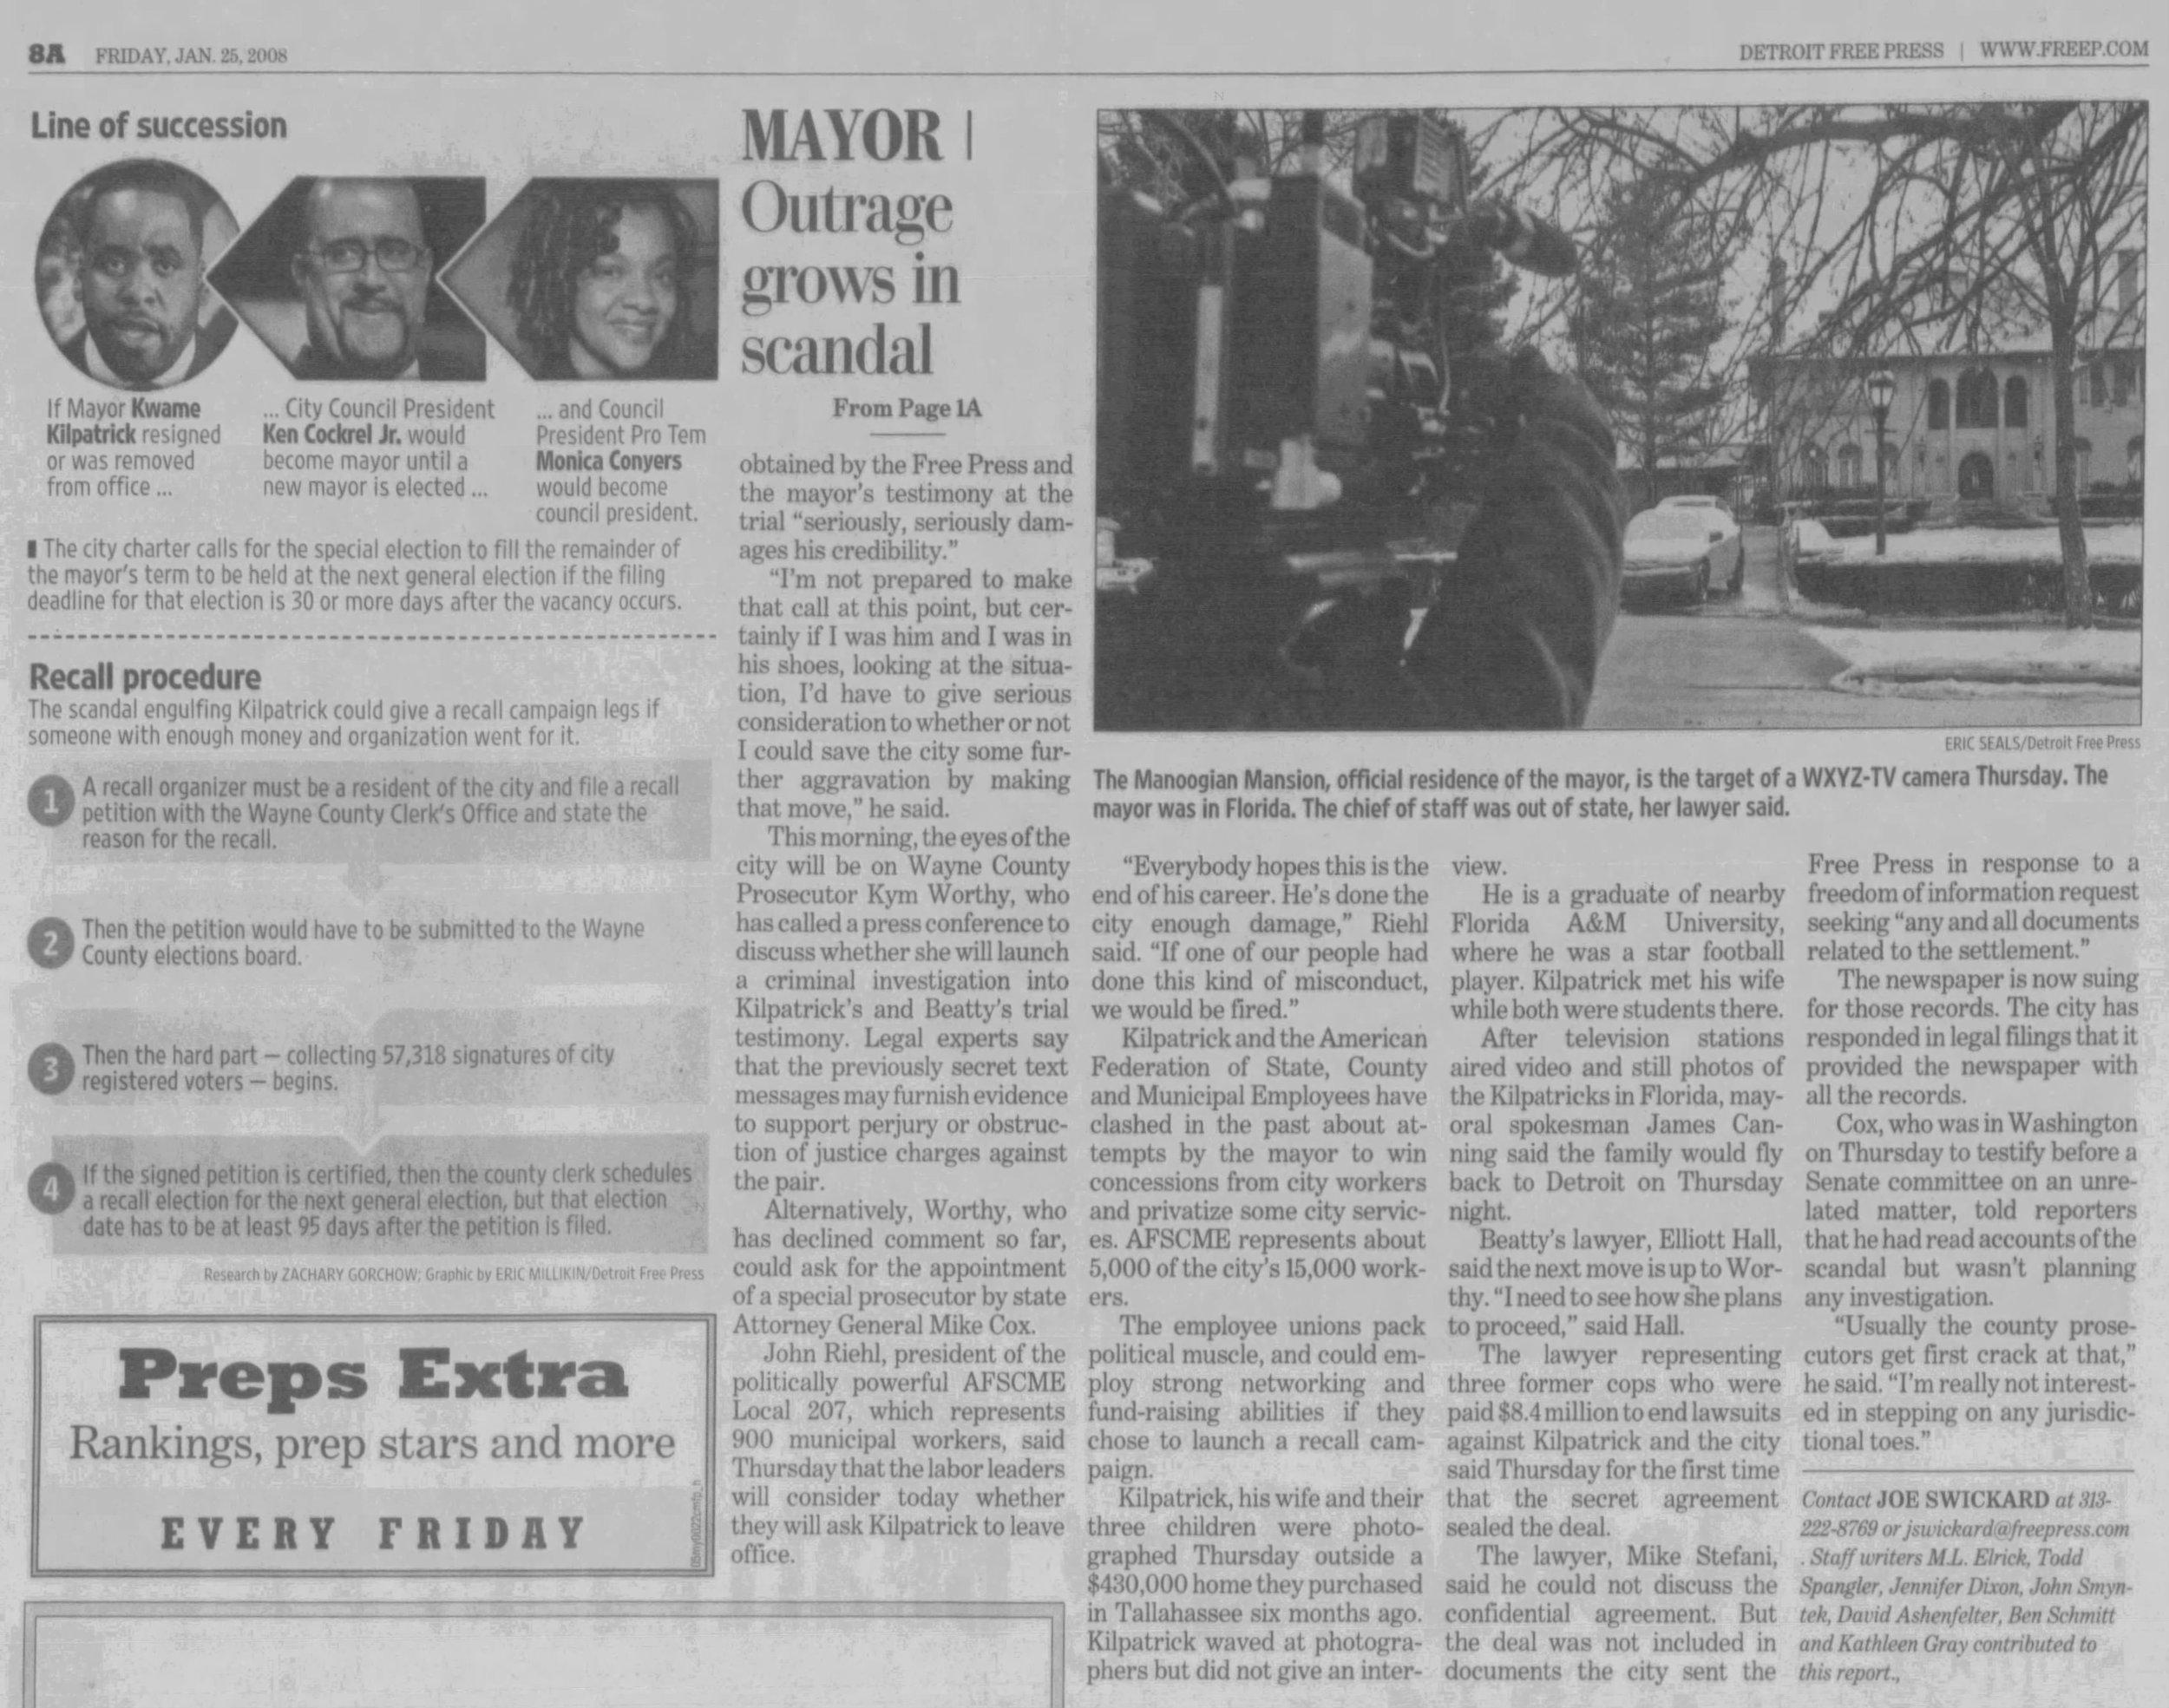 Detroit_Free_Press_Fri__Jan_25__2008_ (1).jpg